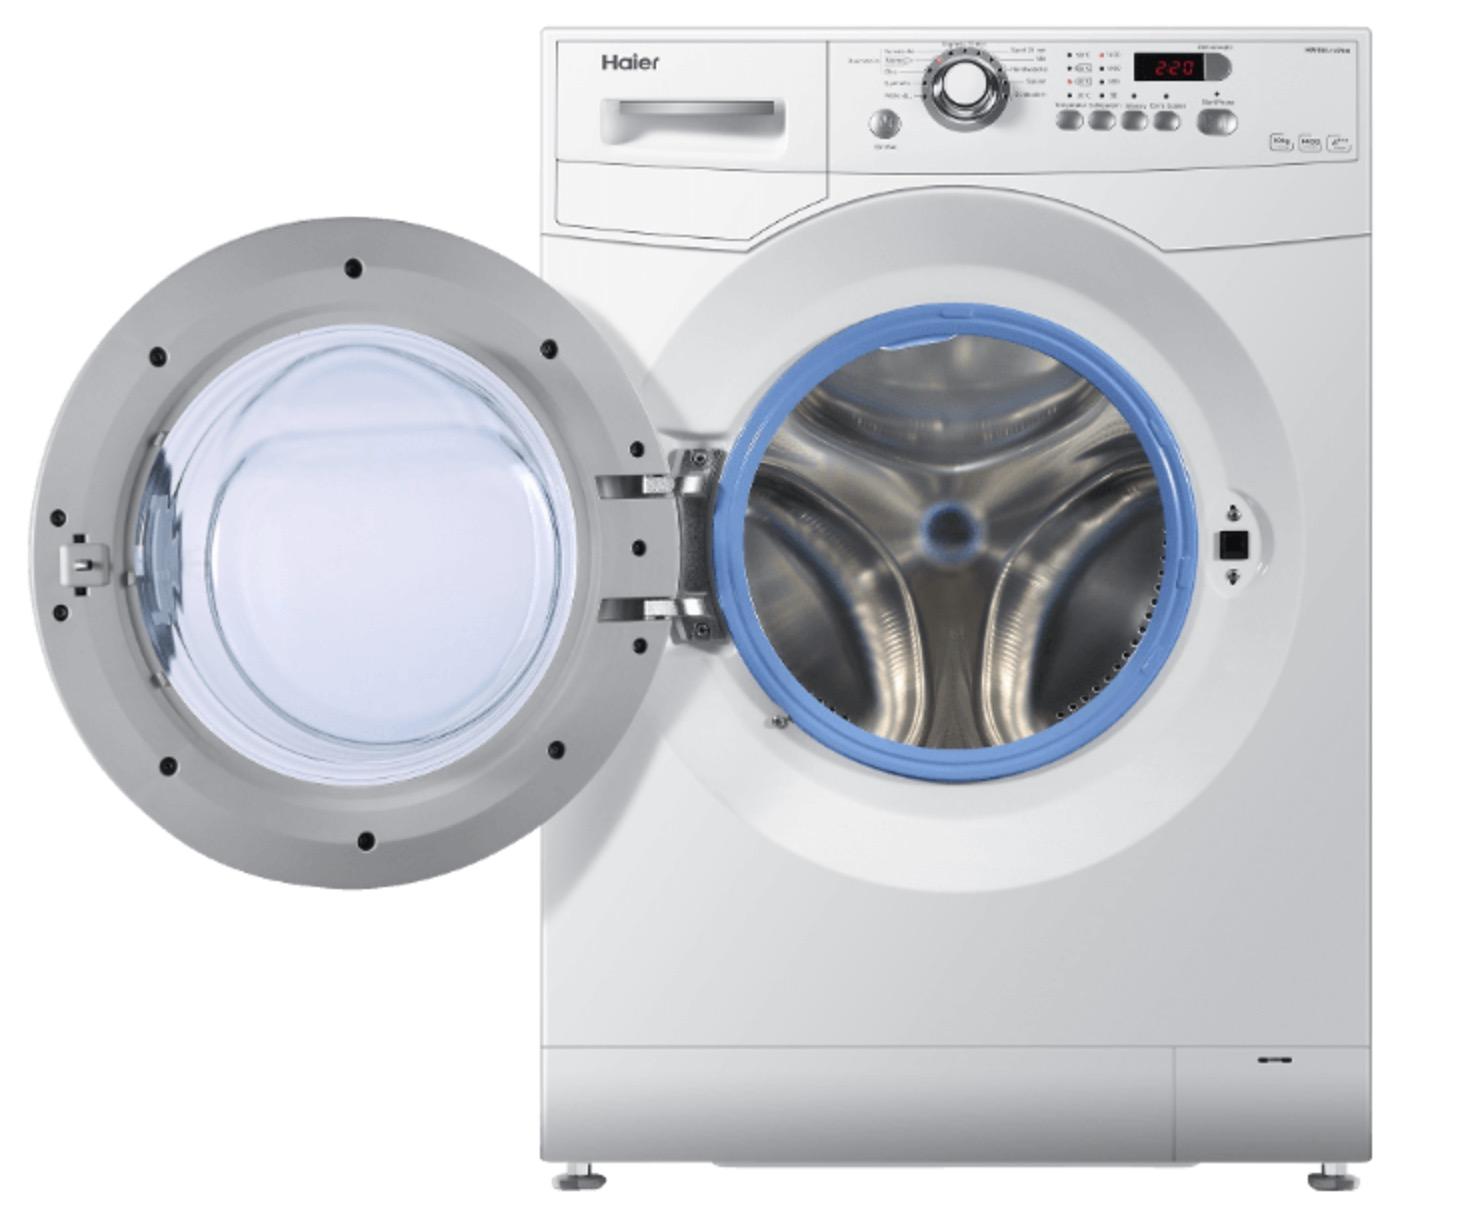 haier hw 100 14636 waschmaschine 10 kg 1400 u min a f r nur 357 euro. Black Bedroom Furniture Sets. Home Design Ideas